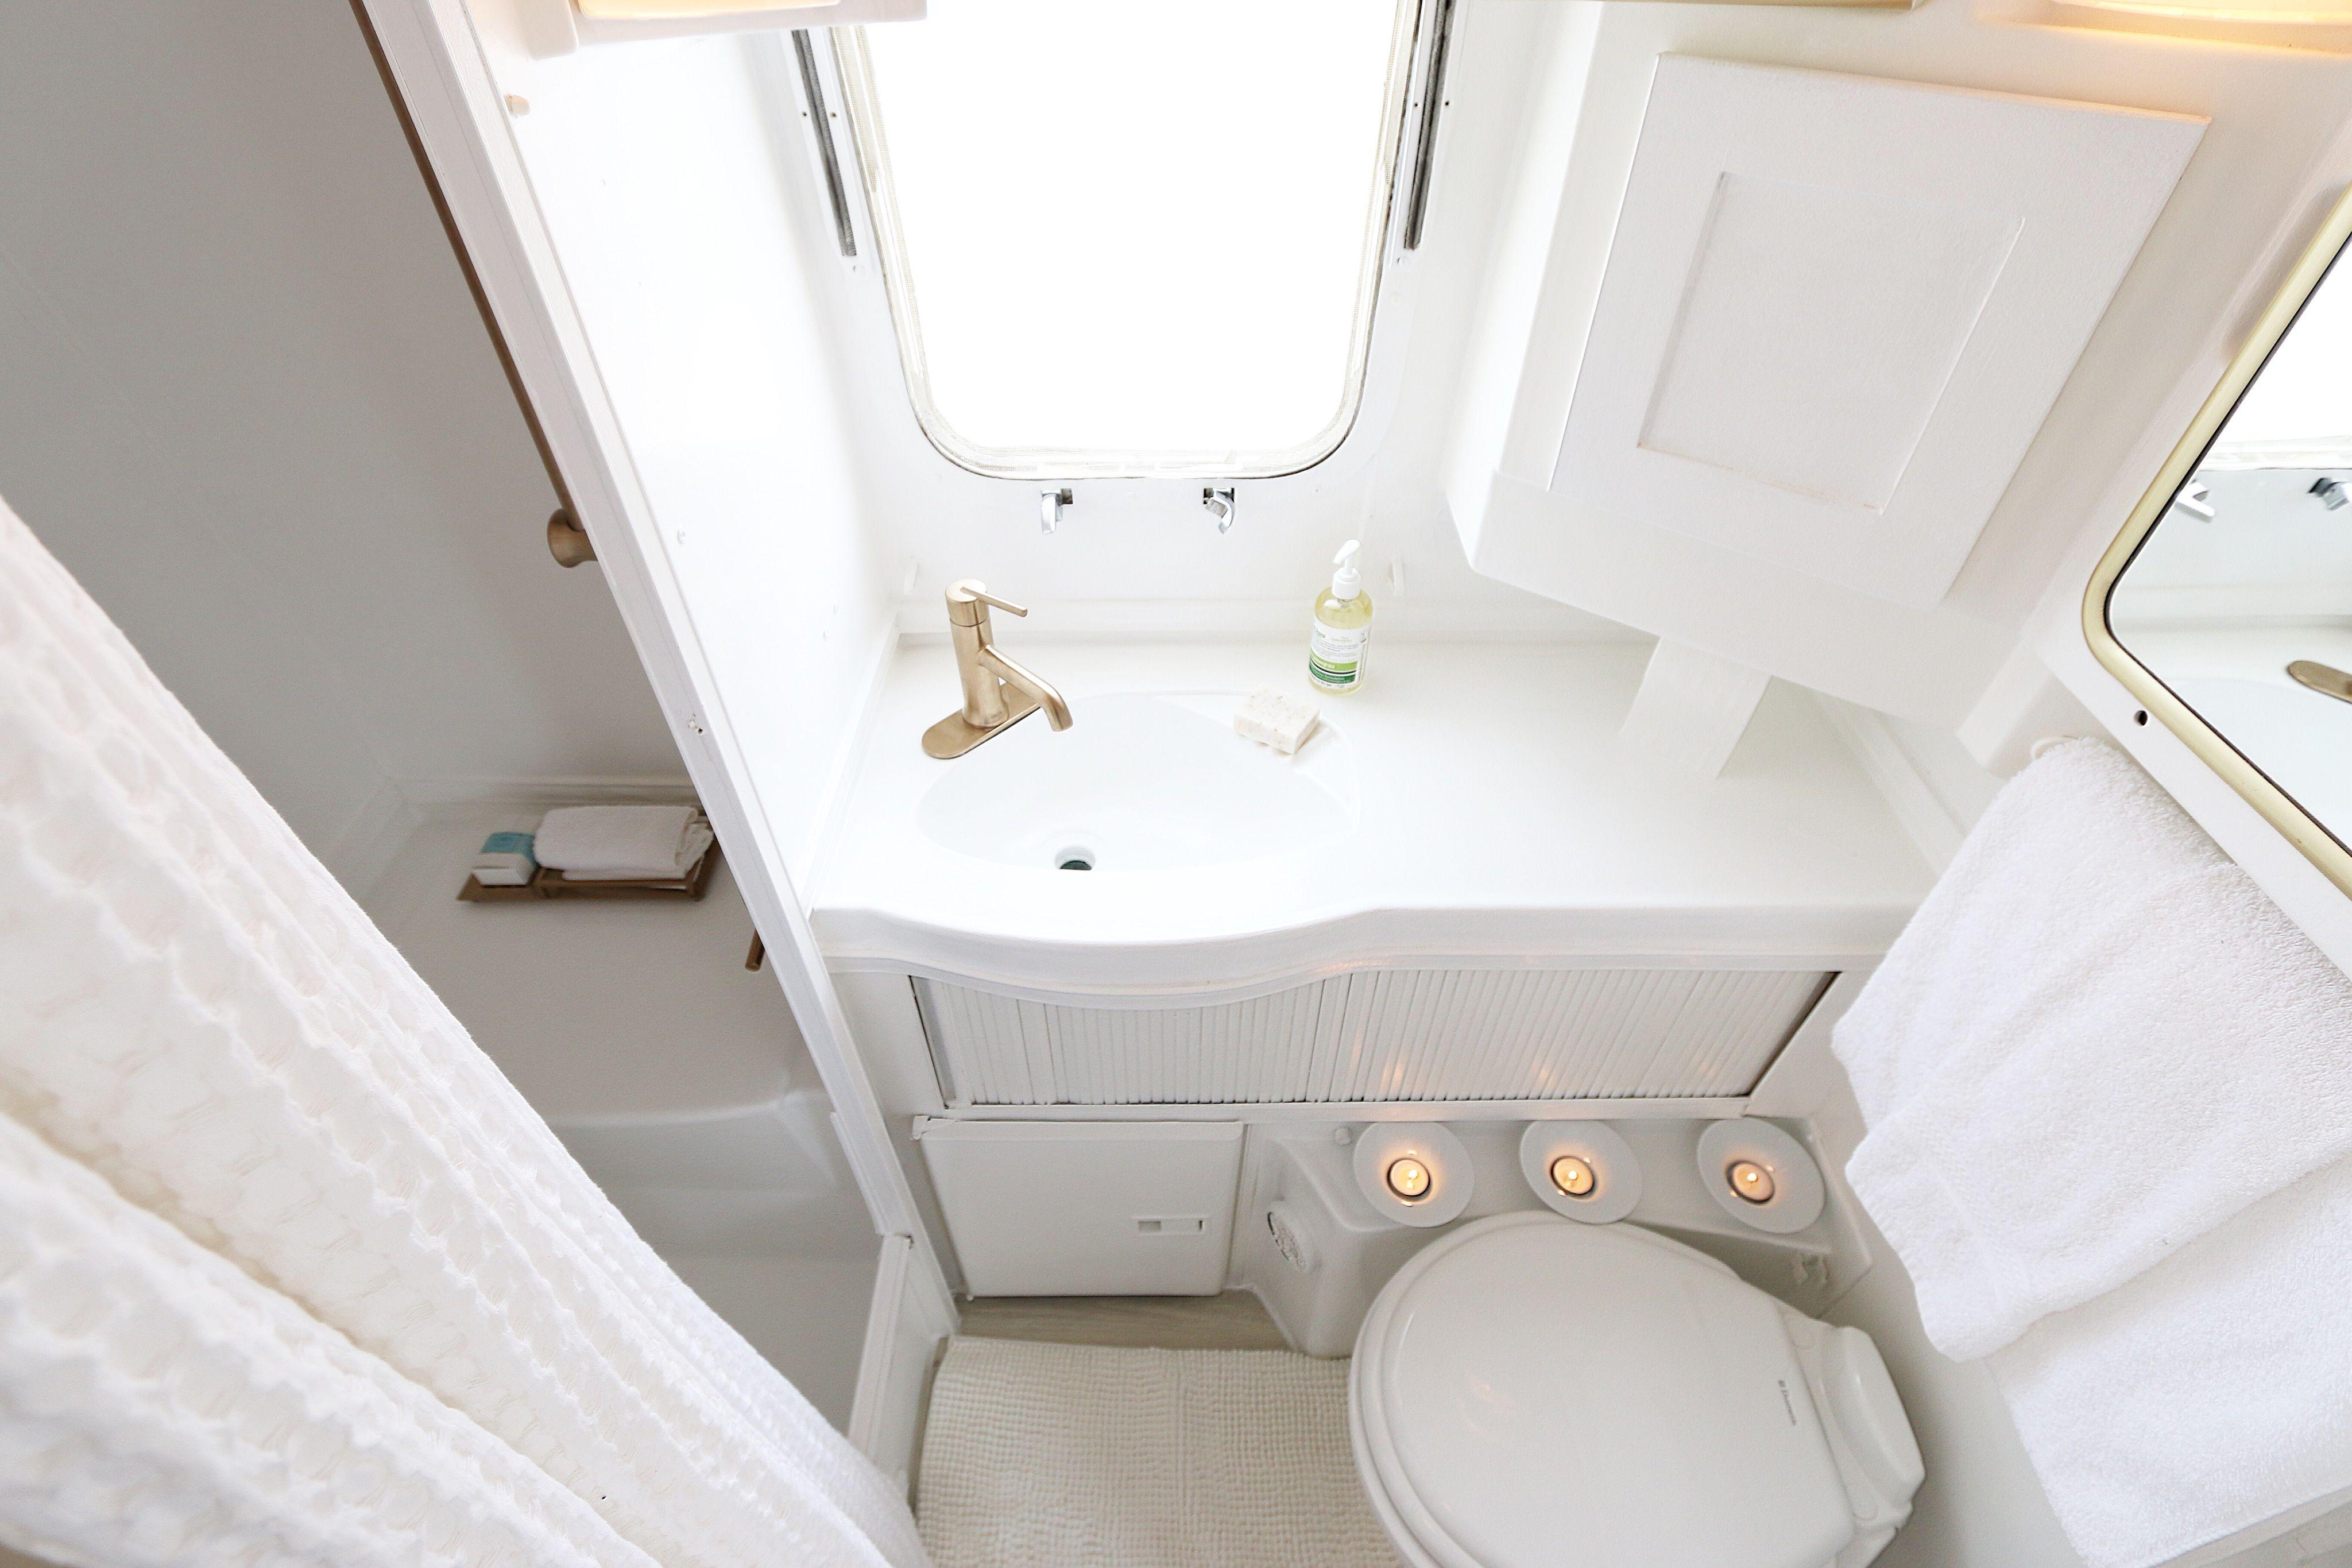 Airstream Bathroom Renovation Httpwwwlynneknowltoncomstart - Starting a bathroom renovation